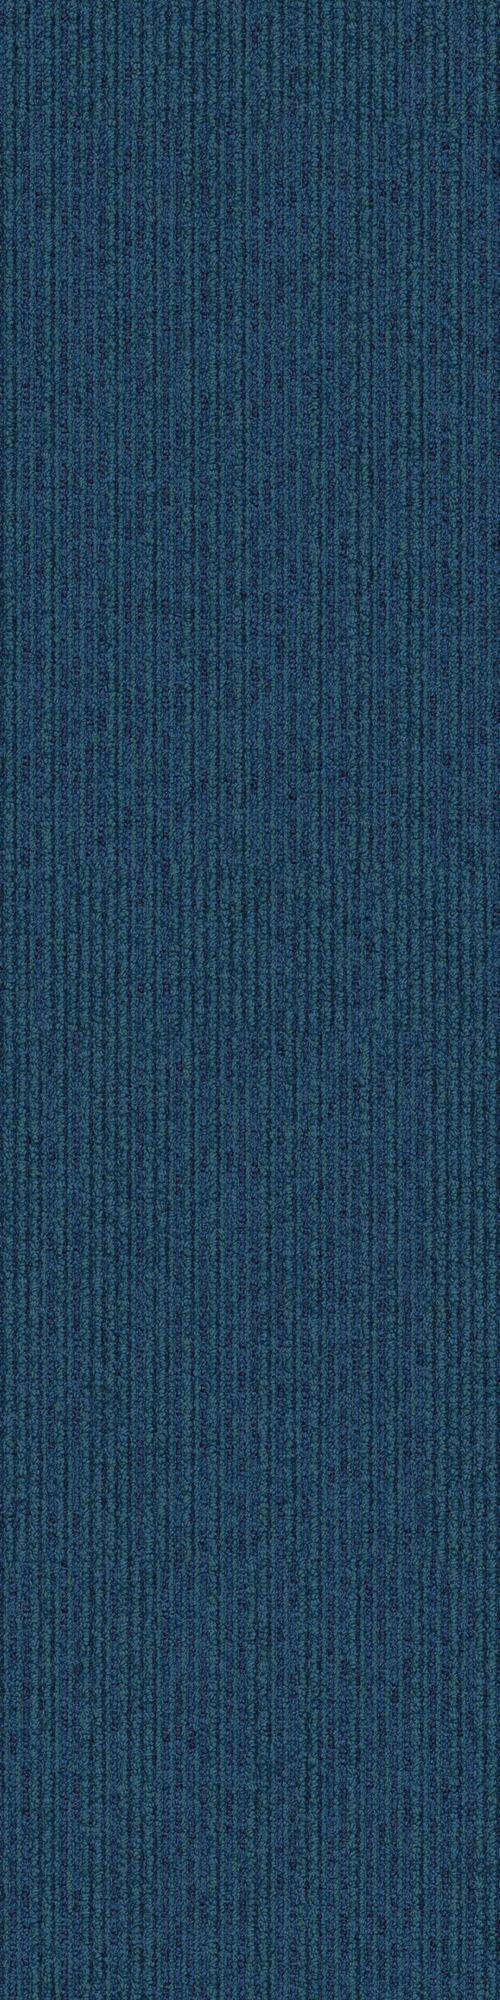 Interface carpet tile: On Line Color name: Aquamarine